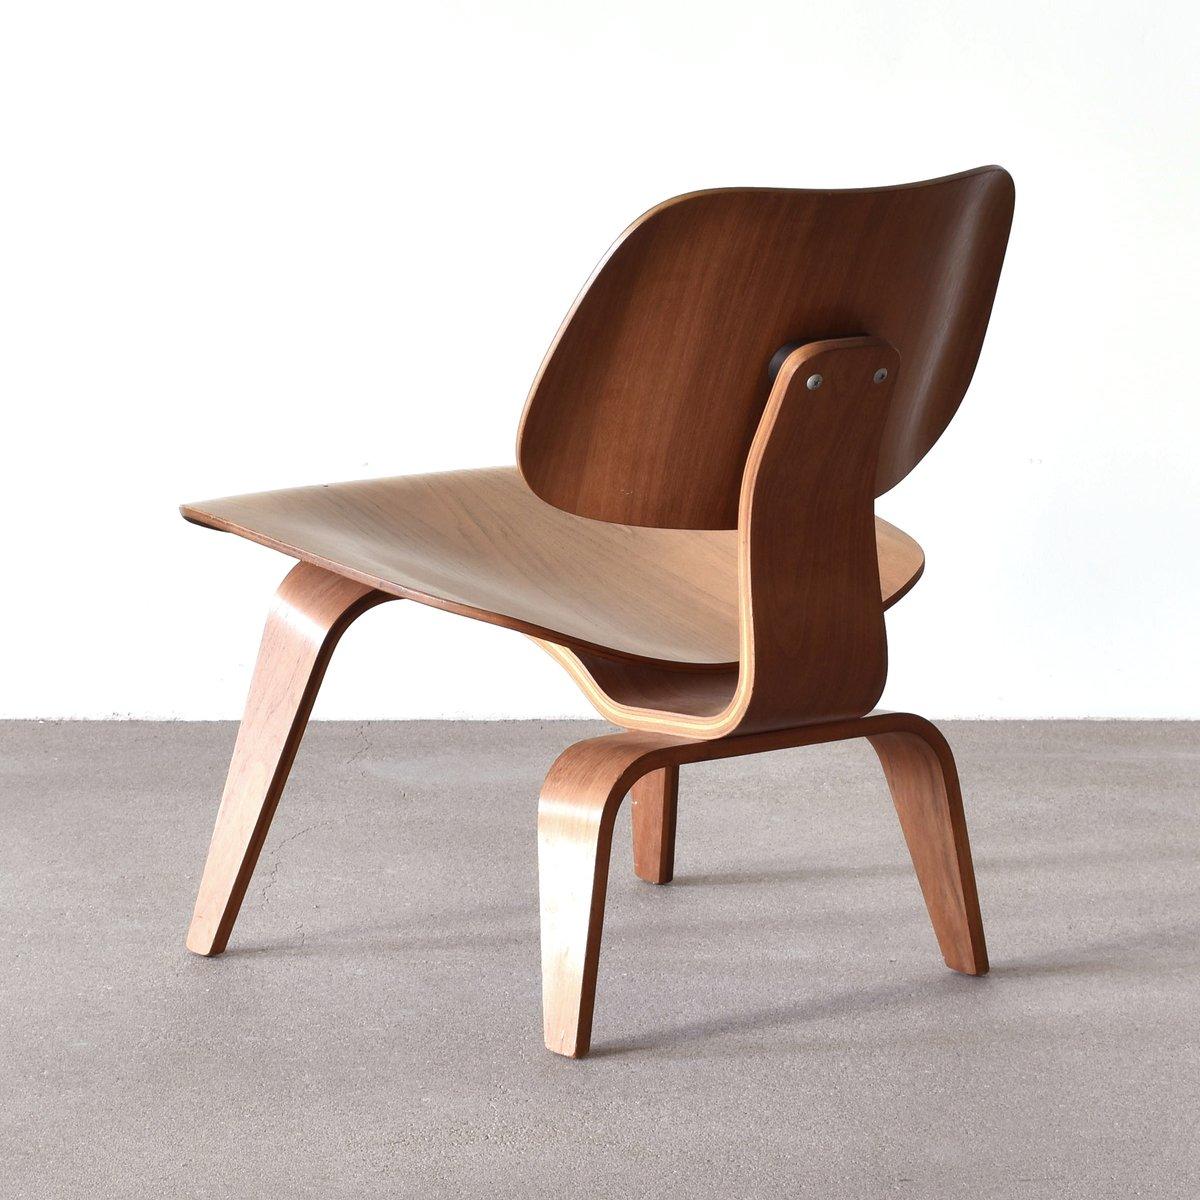 amerikanischer lcw nussholz lounge stuhl von charles ray eames f r herman miller 1953 bei. Black Bedroom Furniture Sets. Home Design Ideas